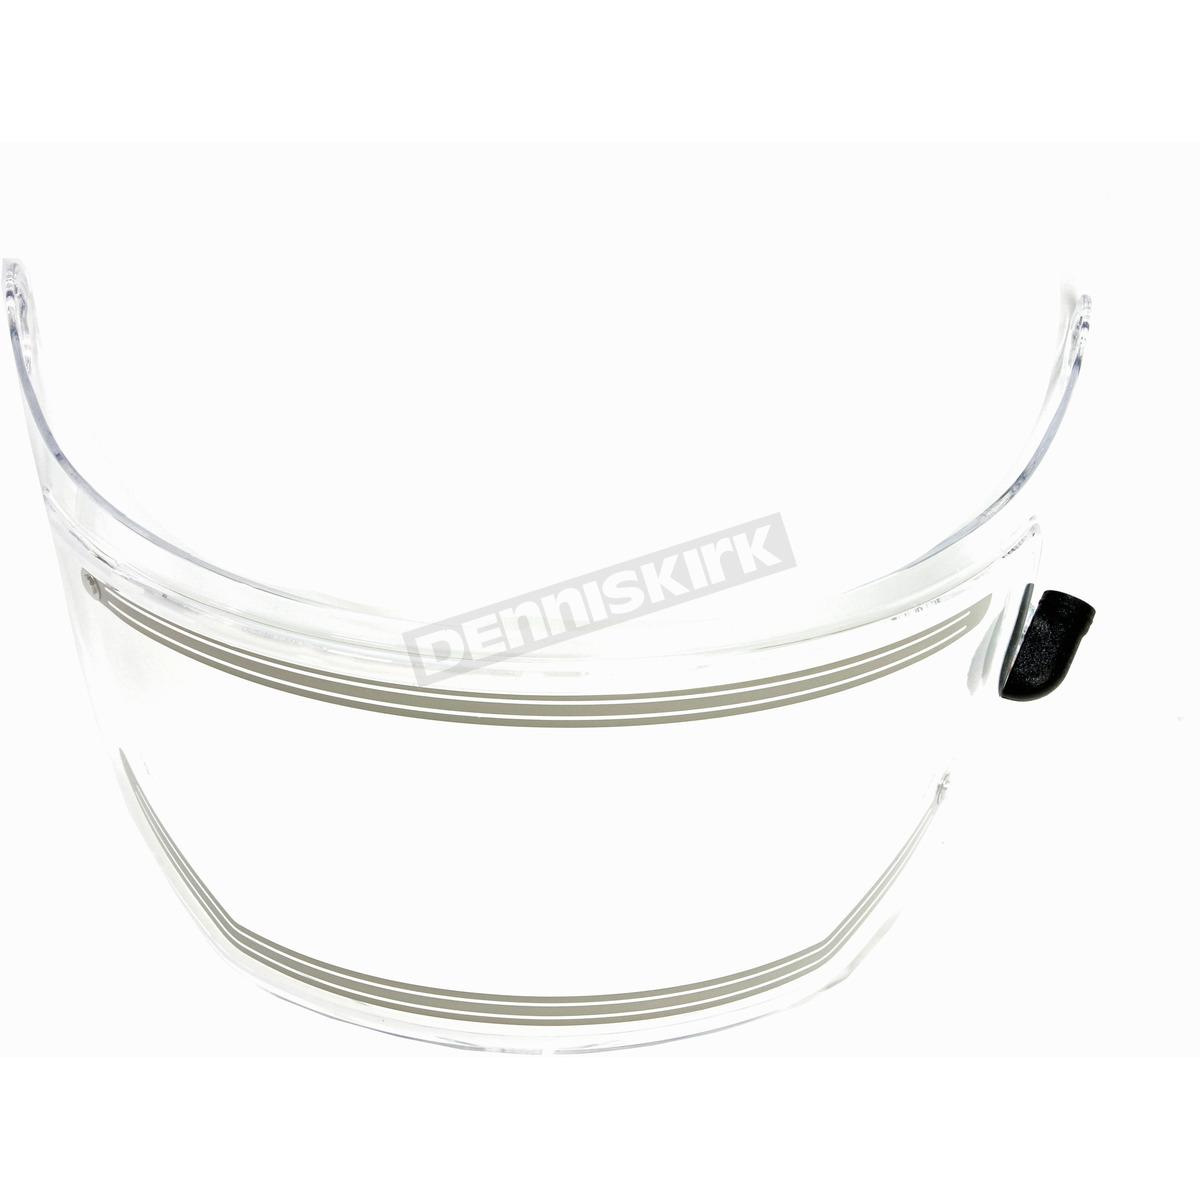 HJC Clear HJ-27 Frameless Electric Shield Kit for DS-X1